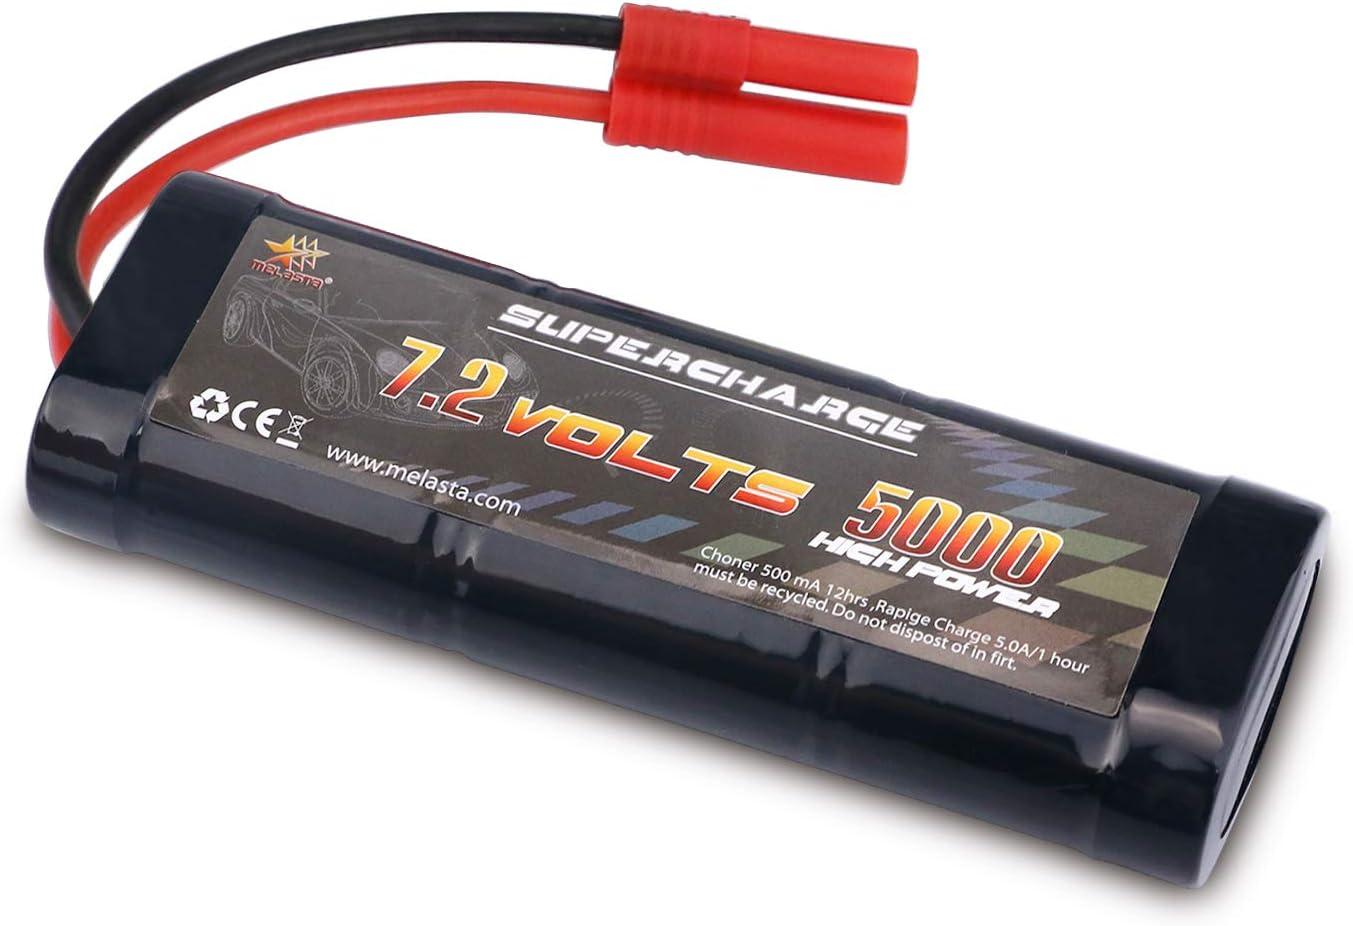 Bateria 7.2V 5000mAh NiMH con conector banana